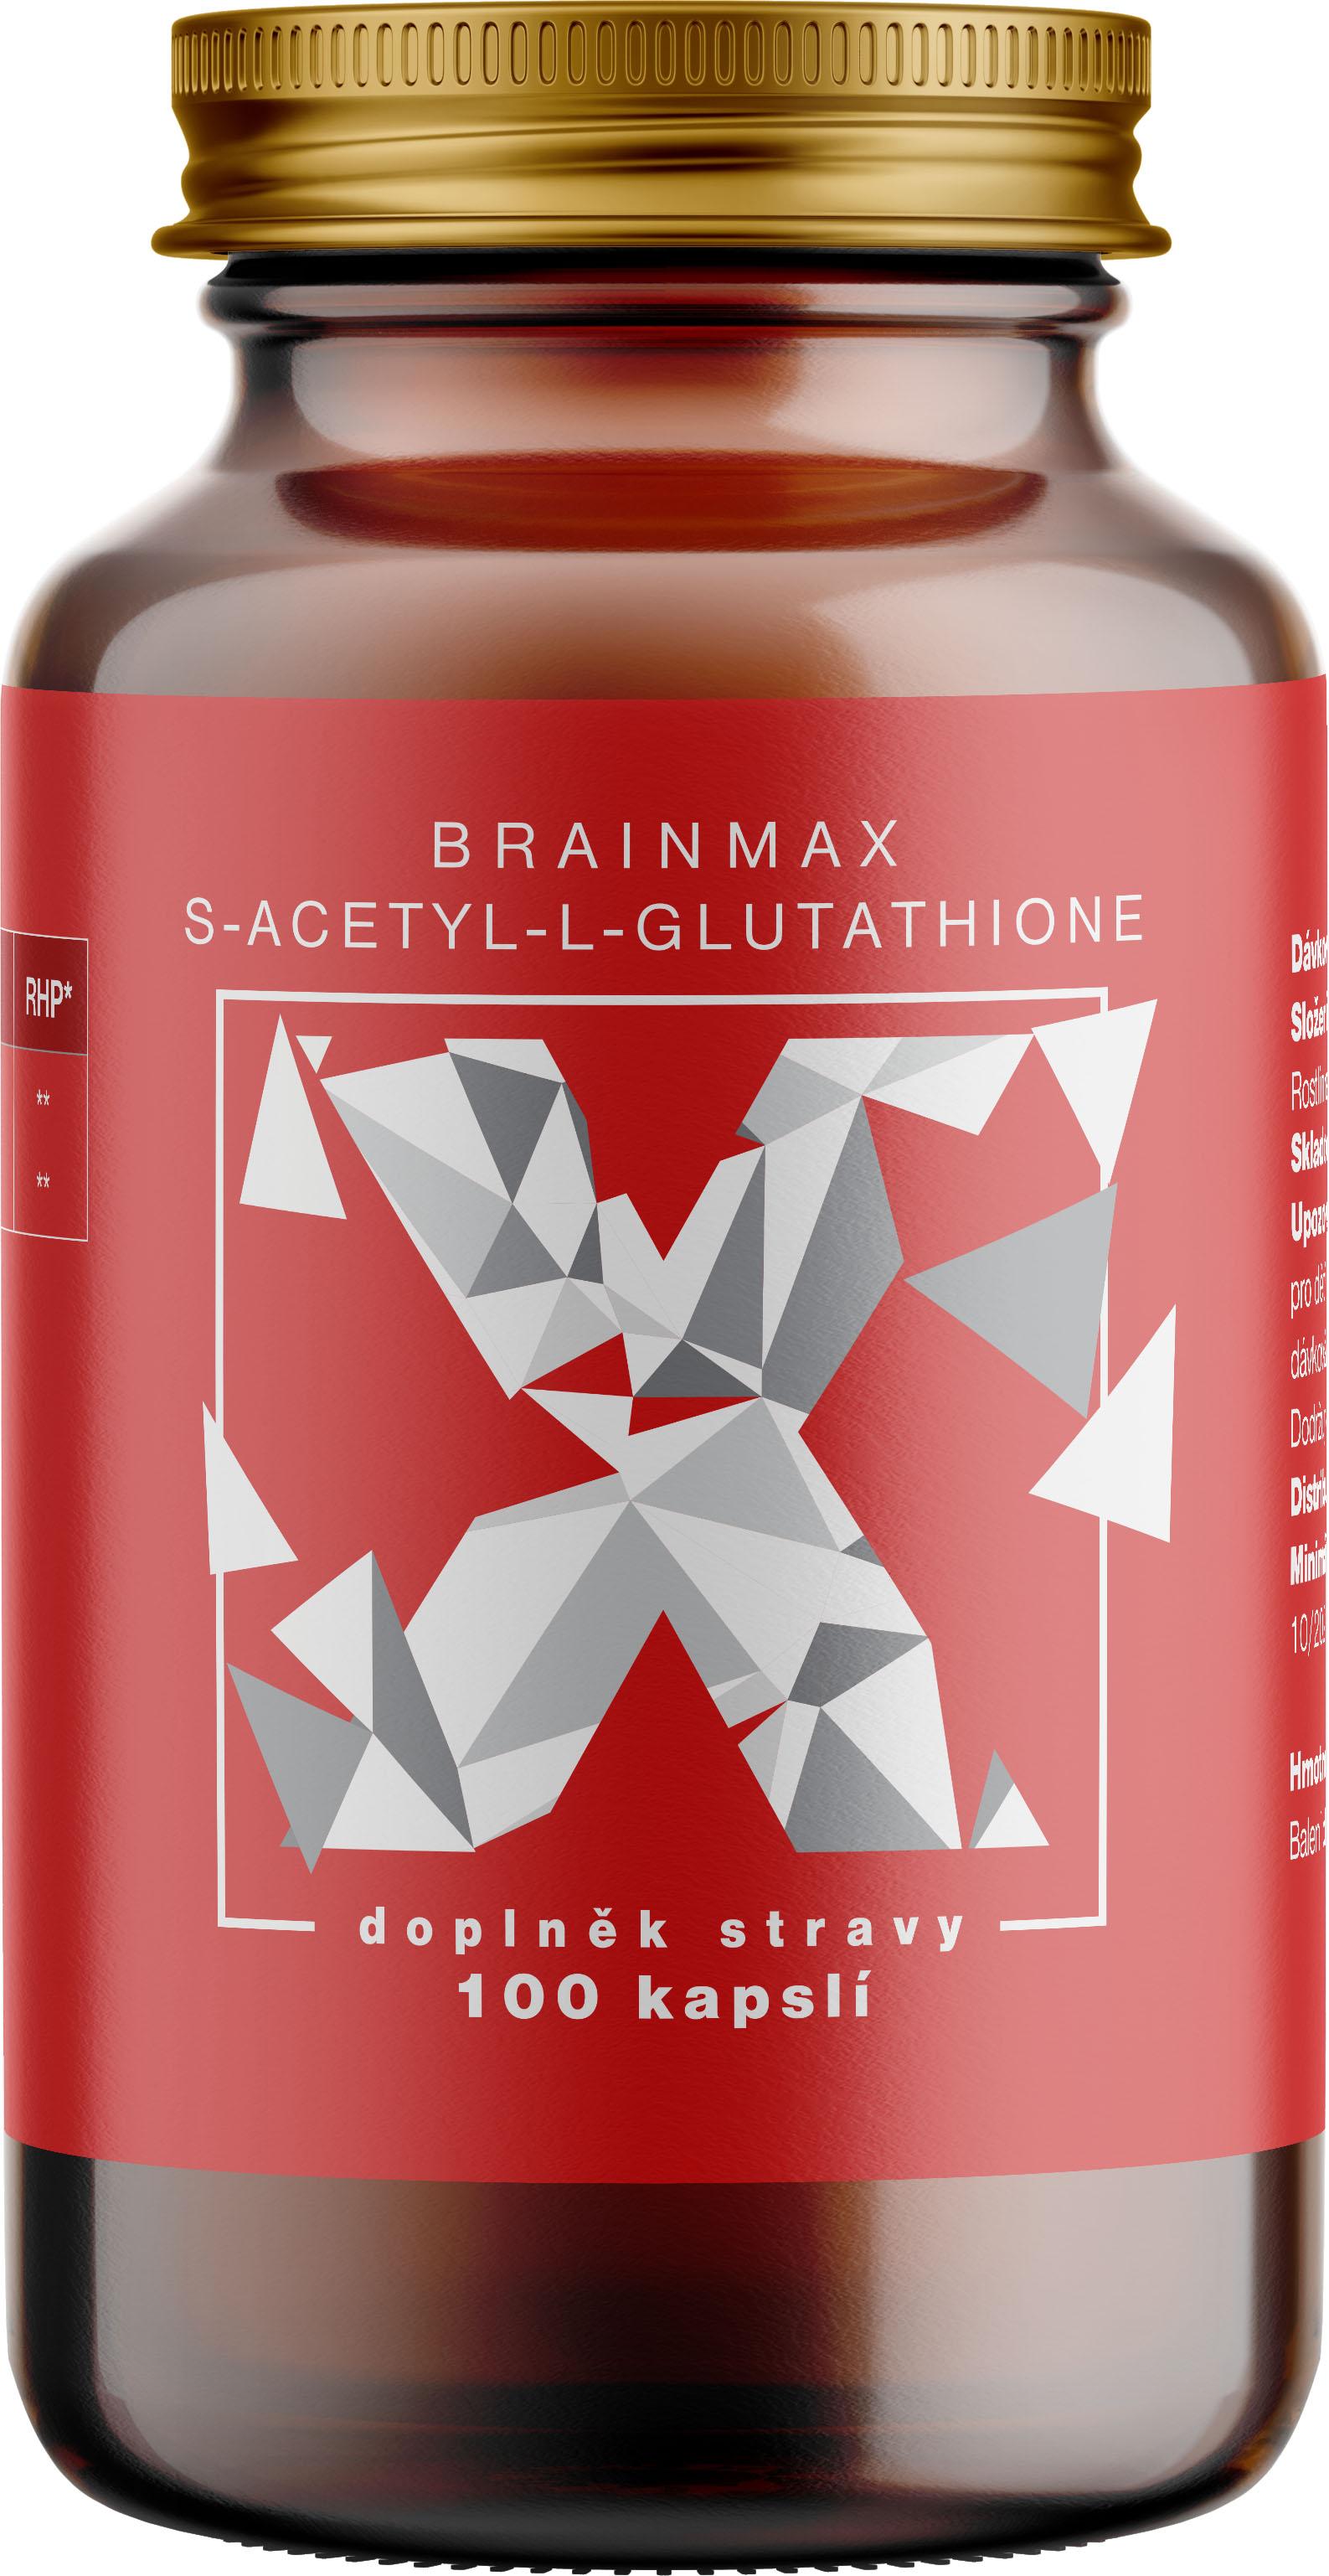 BrainMax S-Acetyl-L-Glutathione, 100 mg, 100 rostlinných kapslí